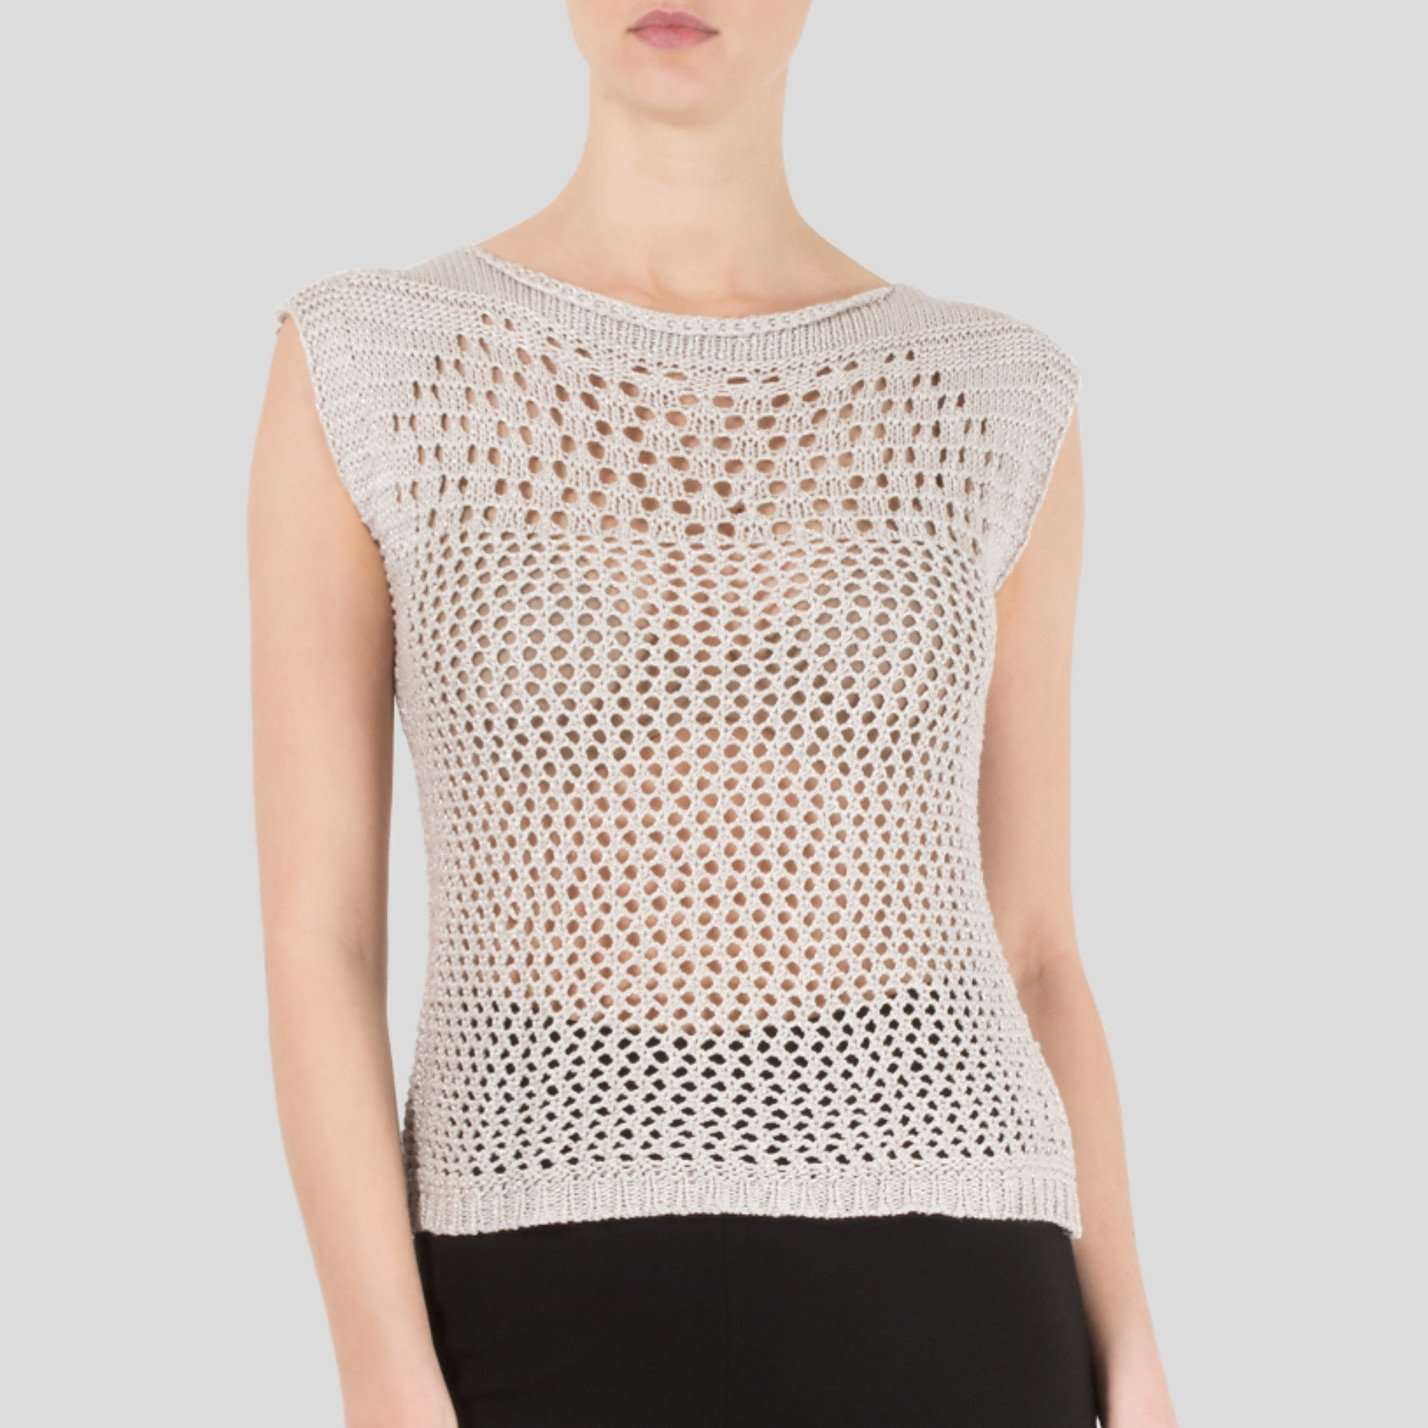 Pierre Balmain Knitted Metallic Top